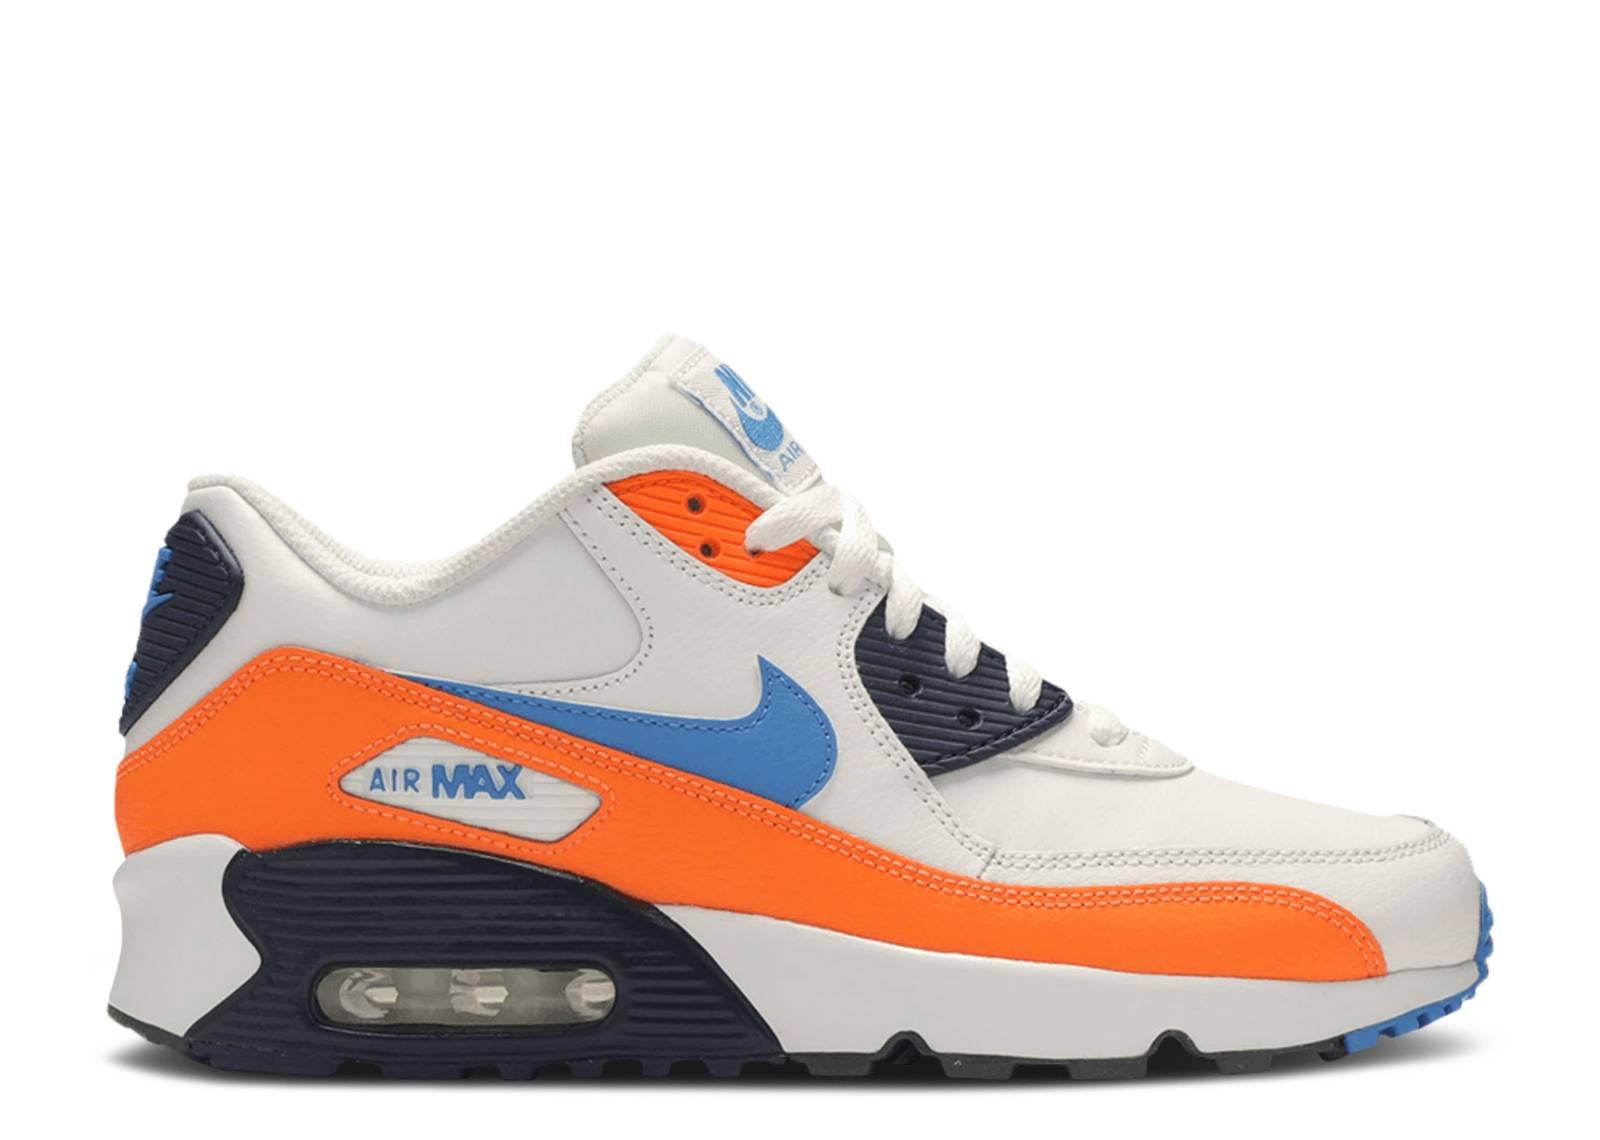 Billiga Nike Air Max 90 Dam Vit taberg.info